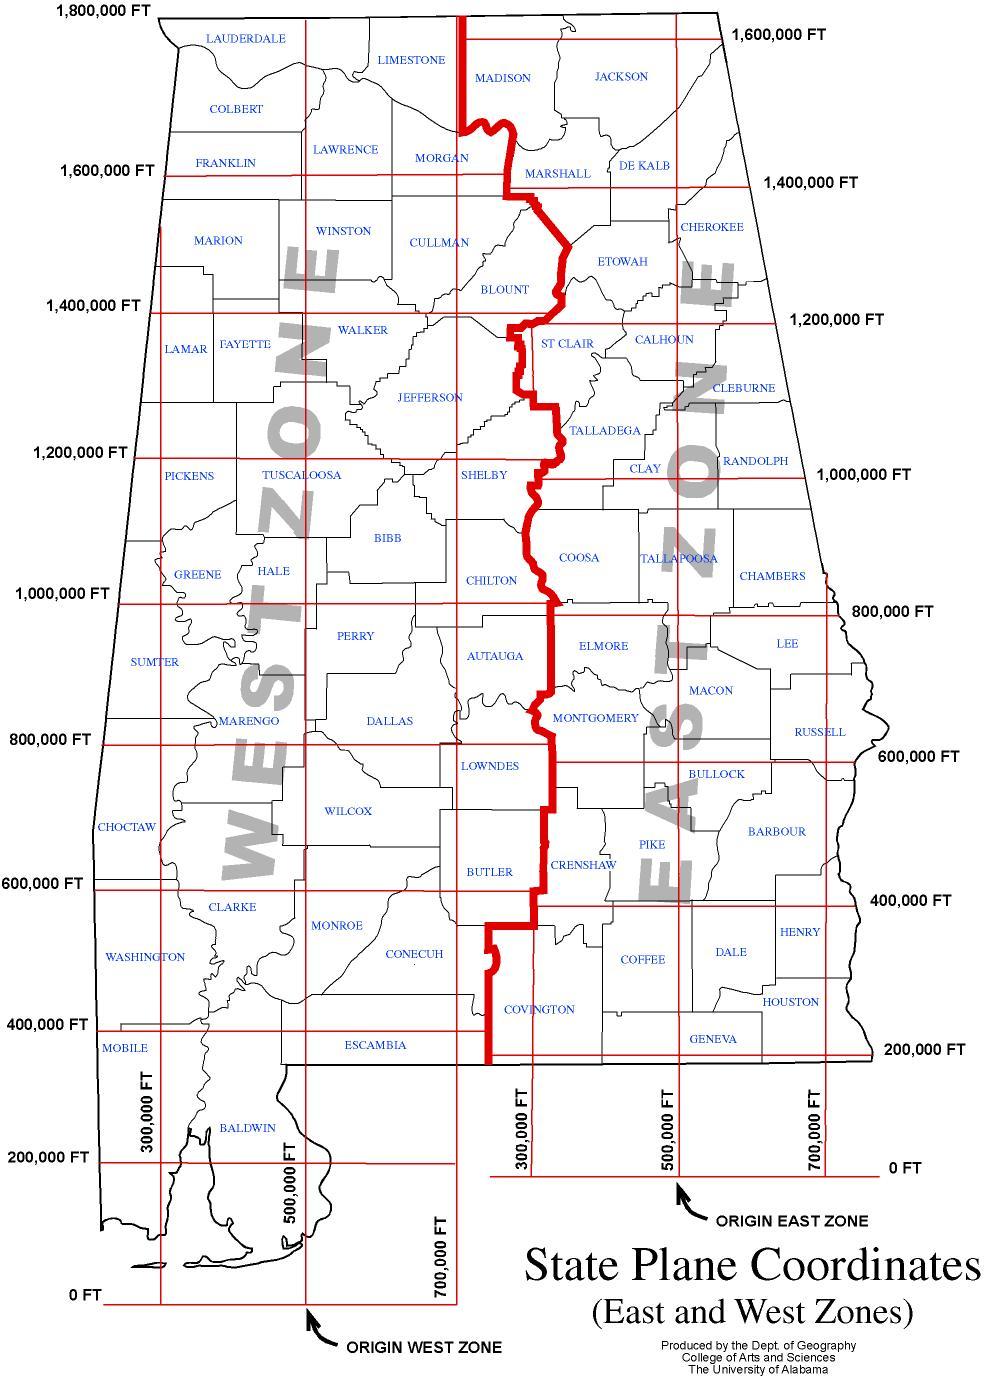 wisconsin zone map, massachusetts zone map, mexico zone map, charlotte zone map, spokane zone map, phoenix zone map, columbus zone map, nebraska zone map, new england zone map, kansas zone map, fort worth zone map, mi zone map, auburn city schools zone map, birmingham zoning map, denver zone map, miami zone map, nashville zone map, north dakota zone map, utah zone map, riverside county zone map, on zone map of alabama